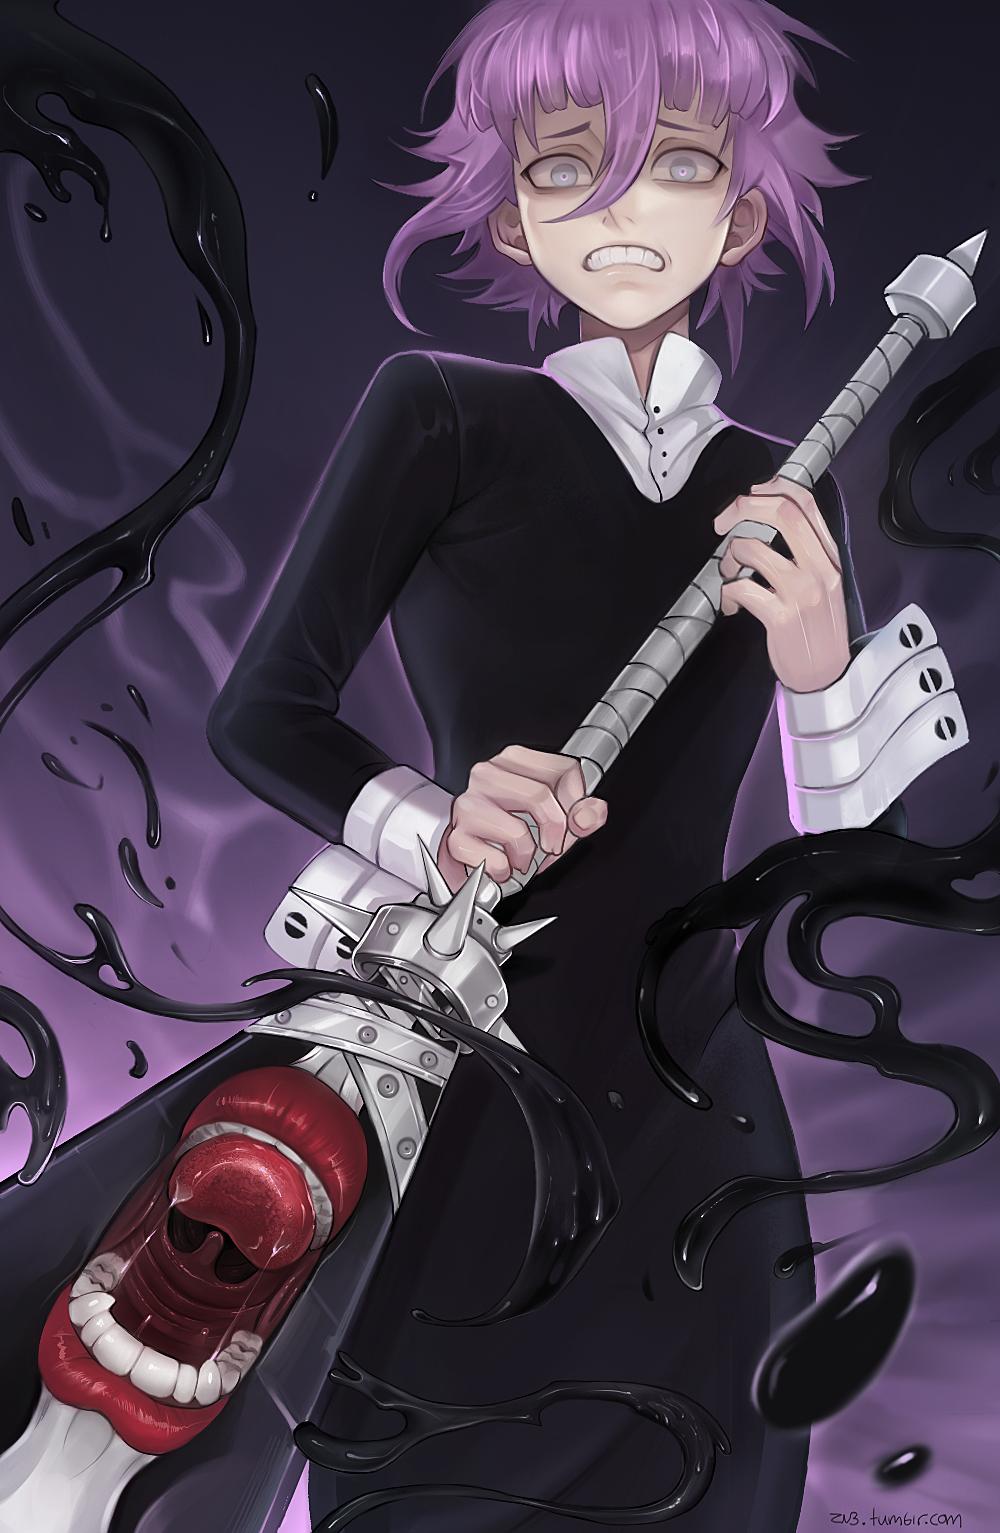 Crona Soul Tumblr Soul eater crona, Anime soul, Soul eater